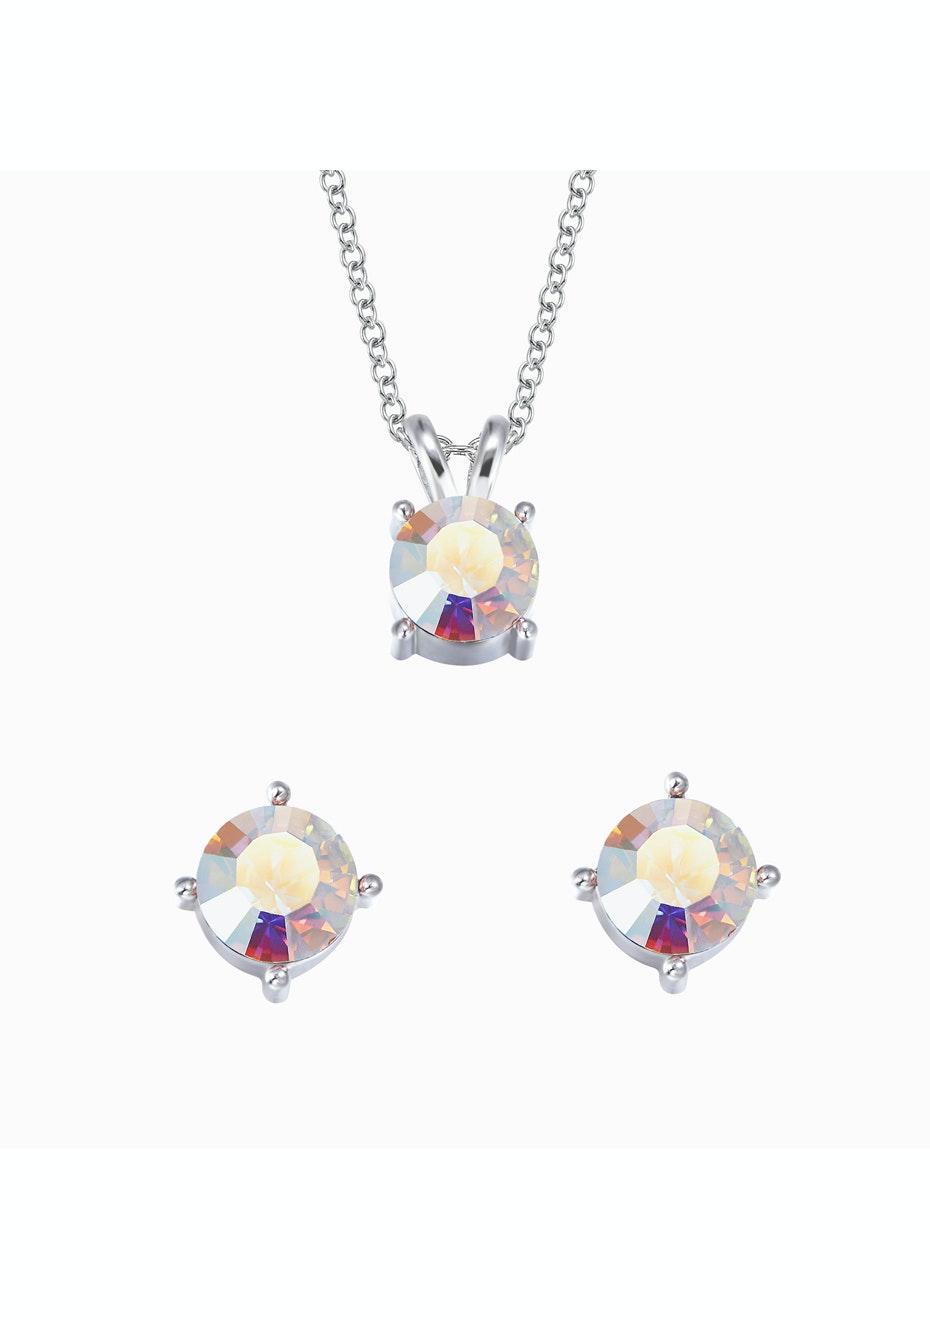 6-in-1 Earring & Necklace Box Set Ft Swarovski Elements